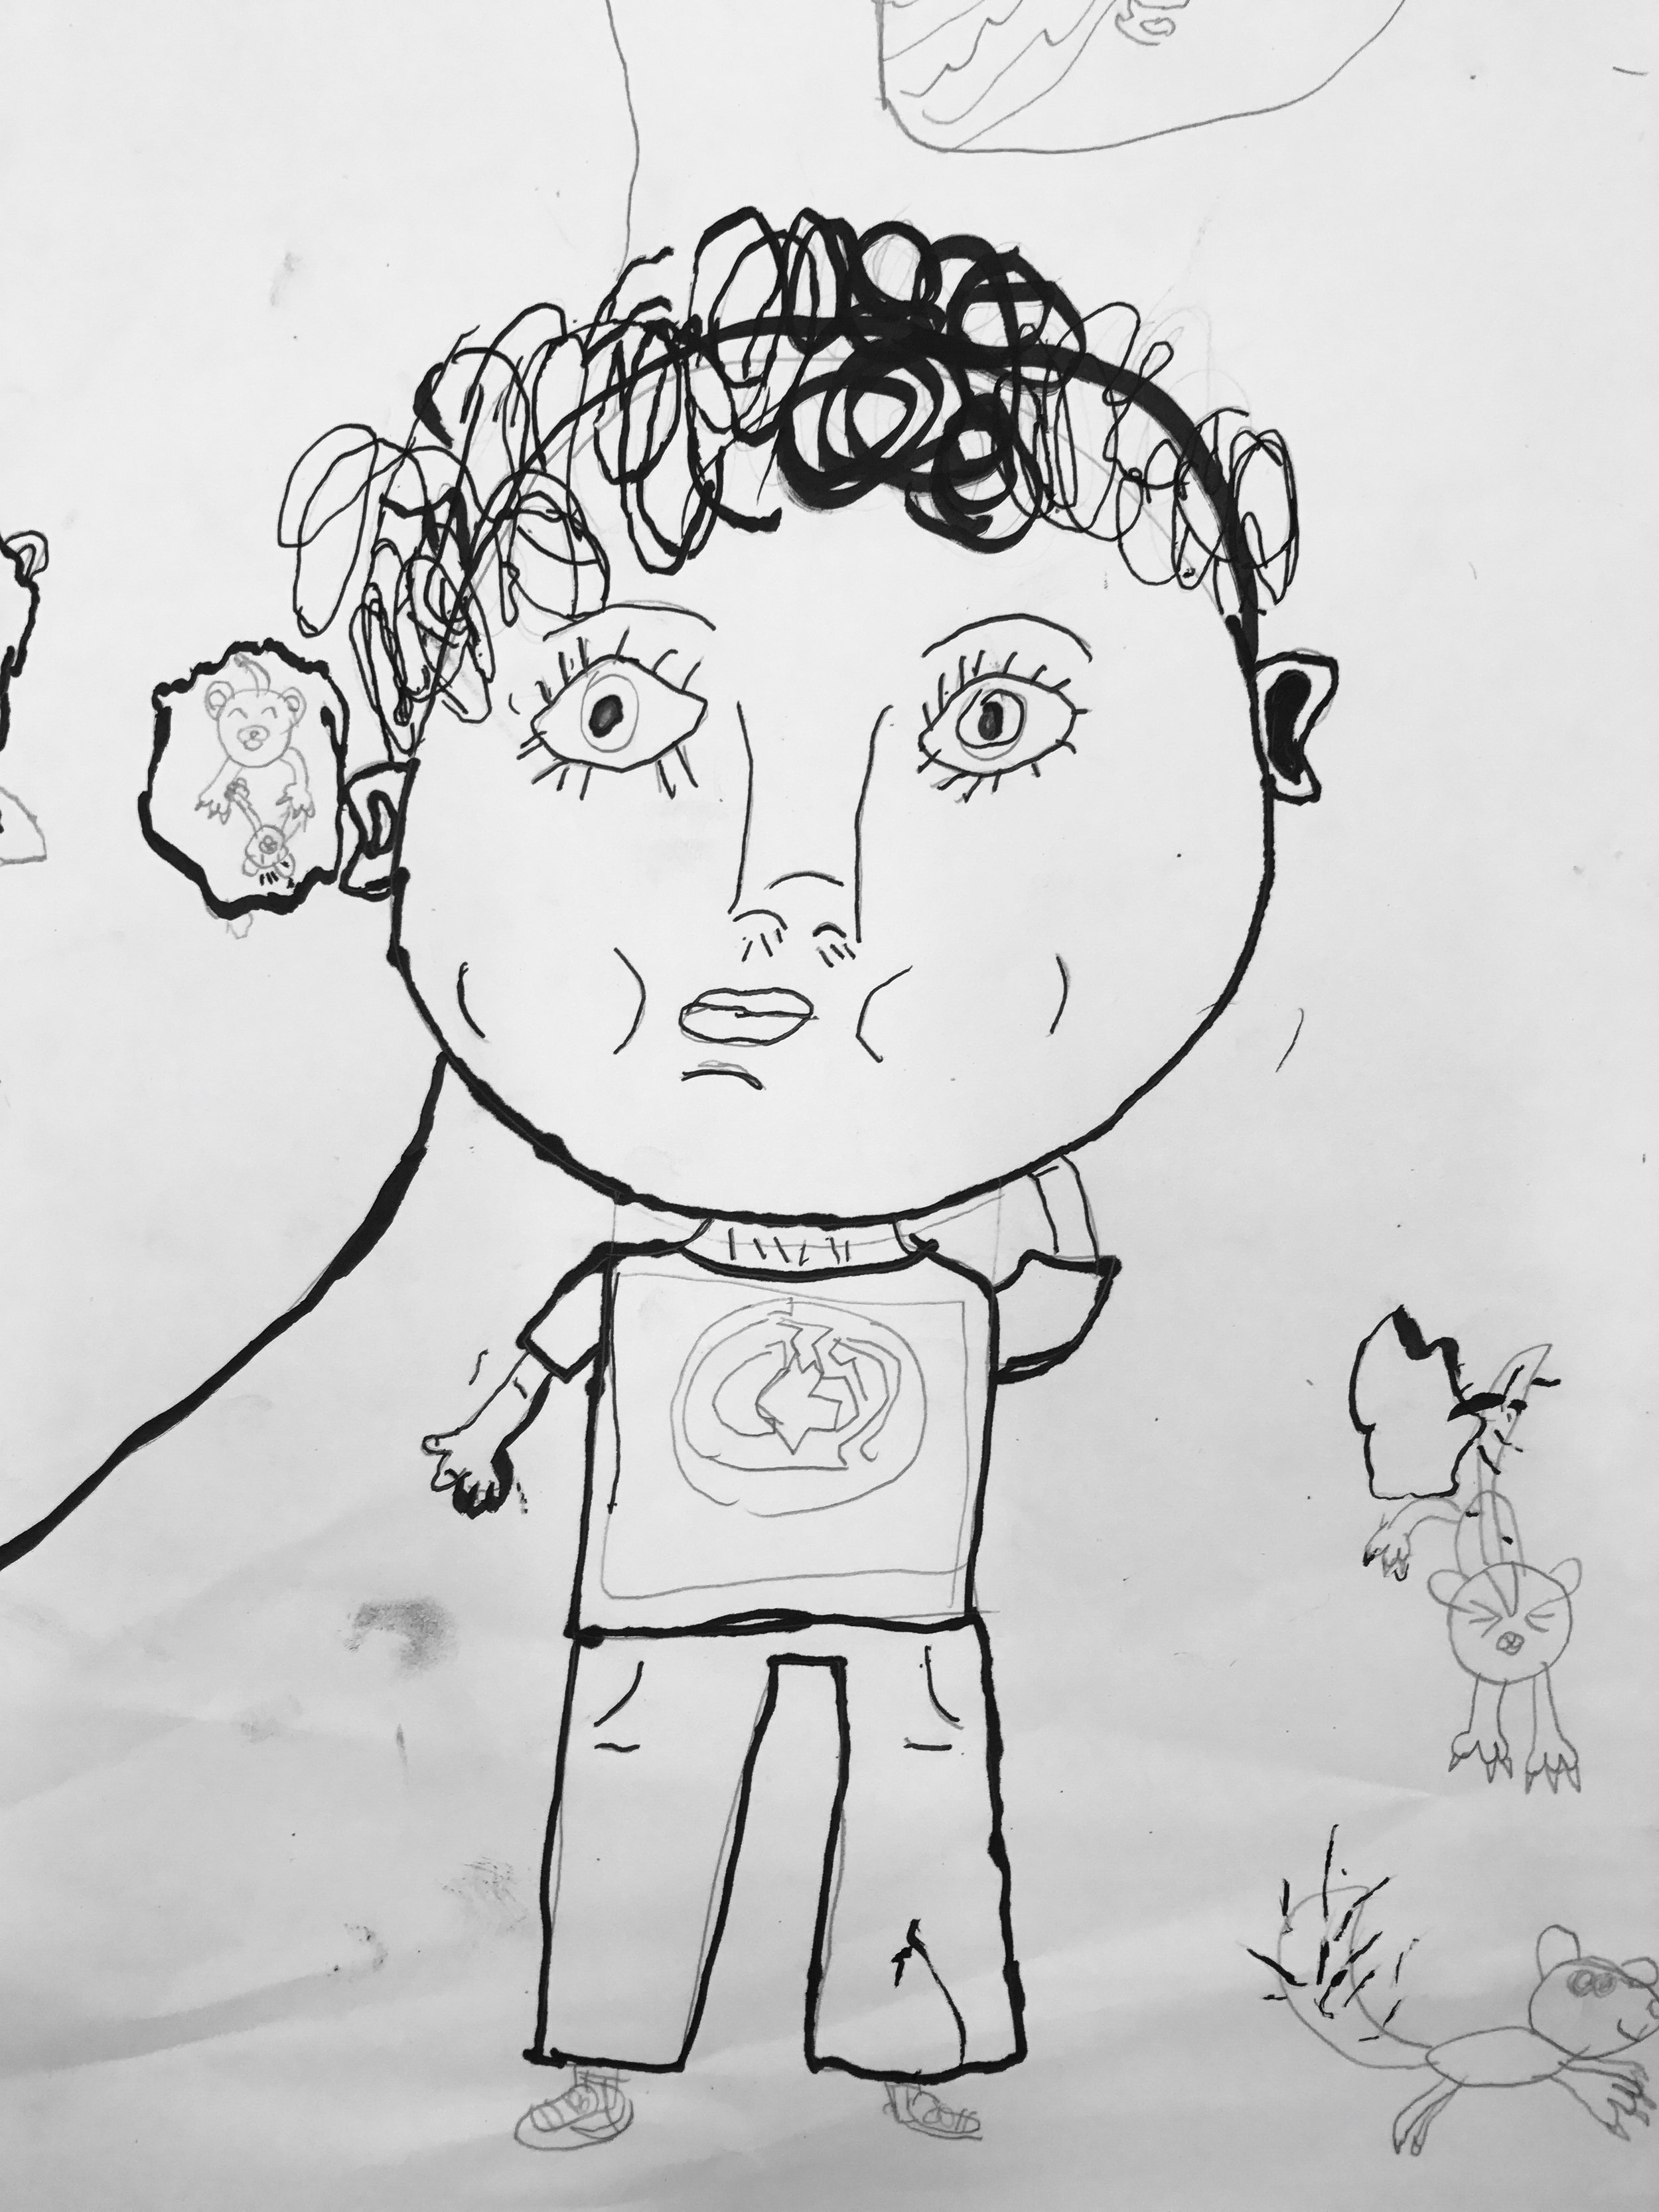 Age 7